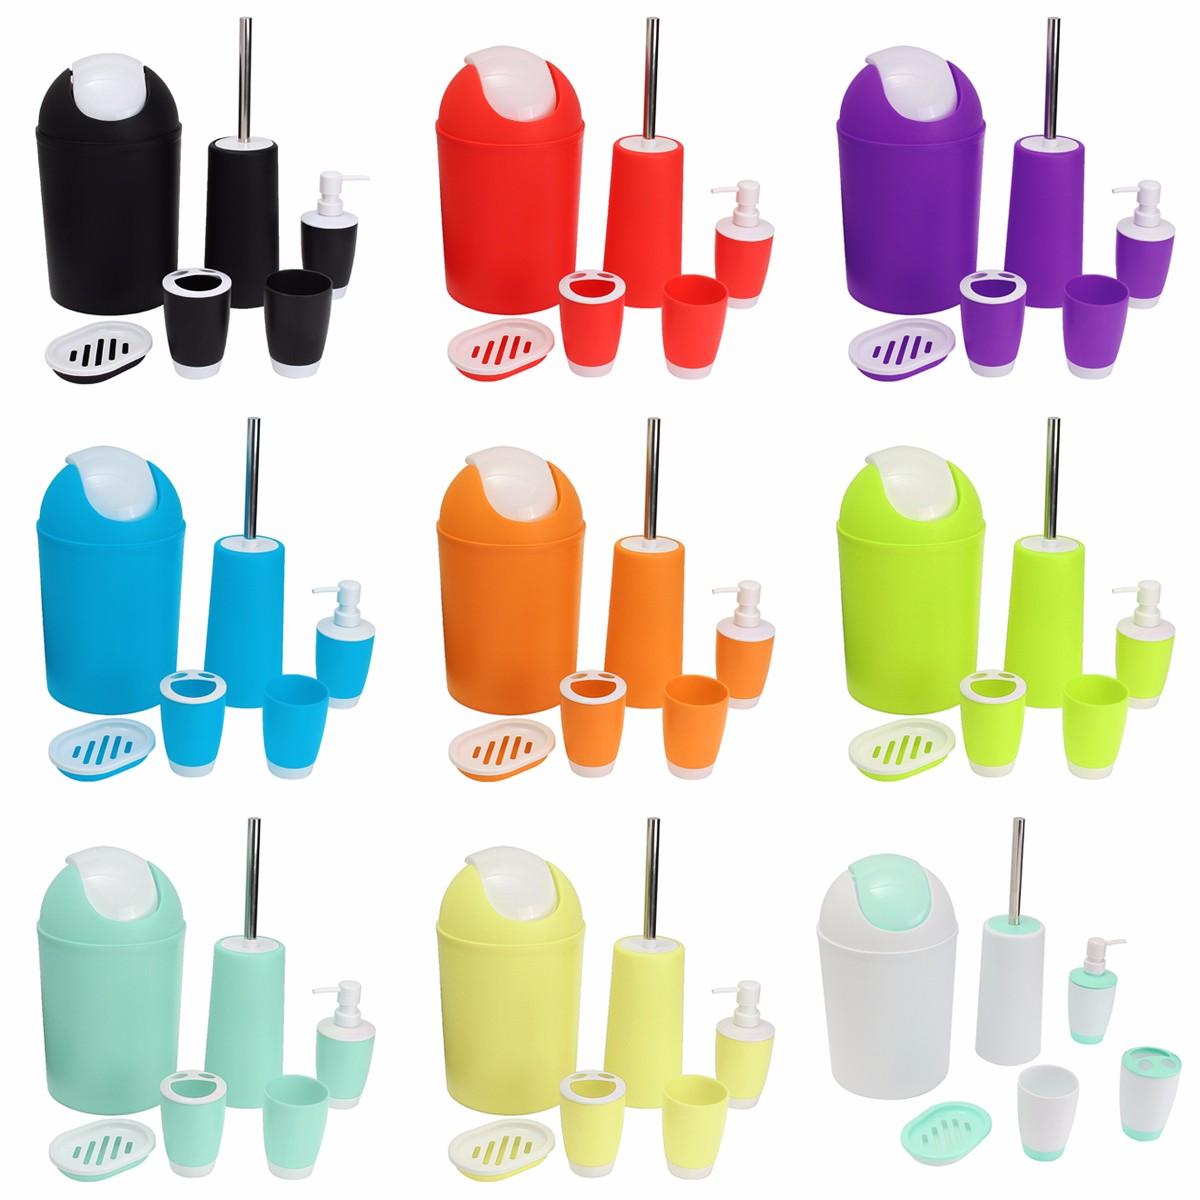 Image Is Loading 6PCS Plastic Bathroom  Accessory Dispenser Toothbrush Holder Tumbler